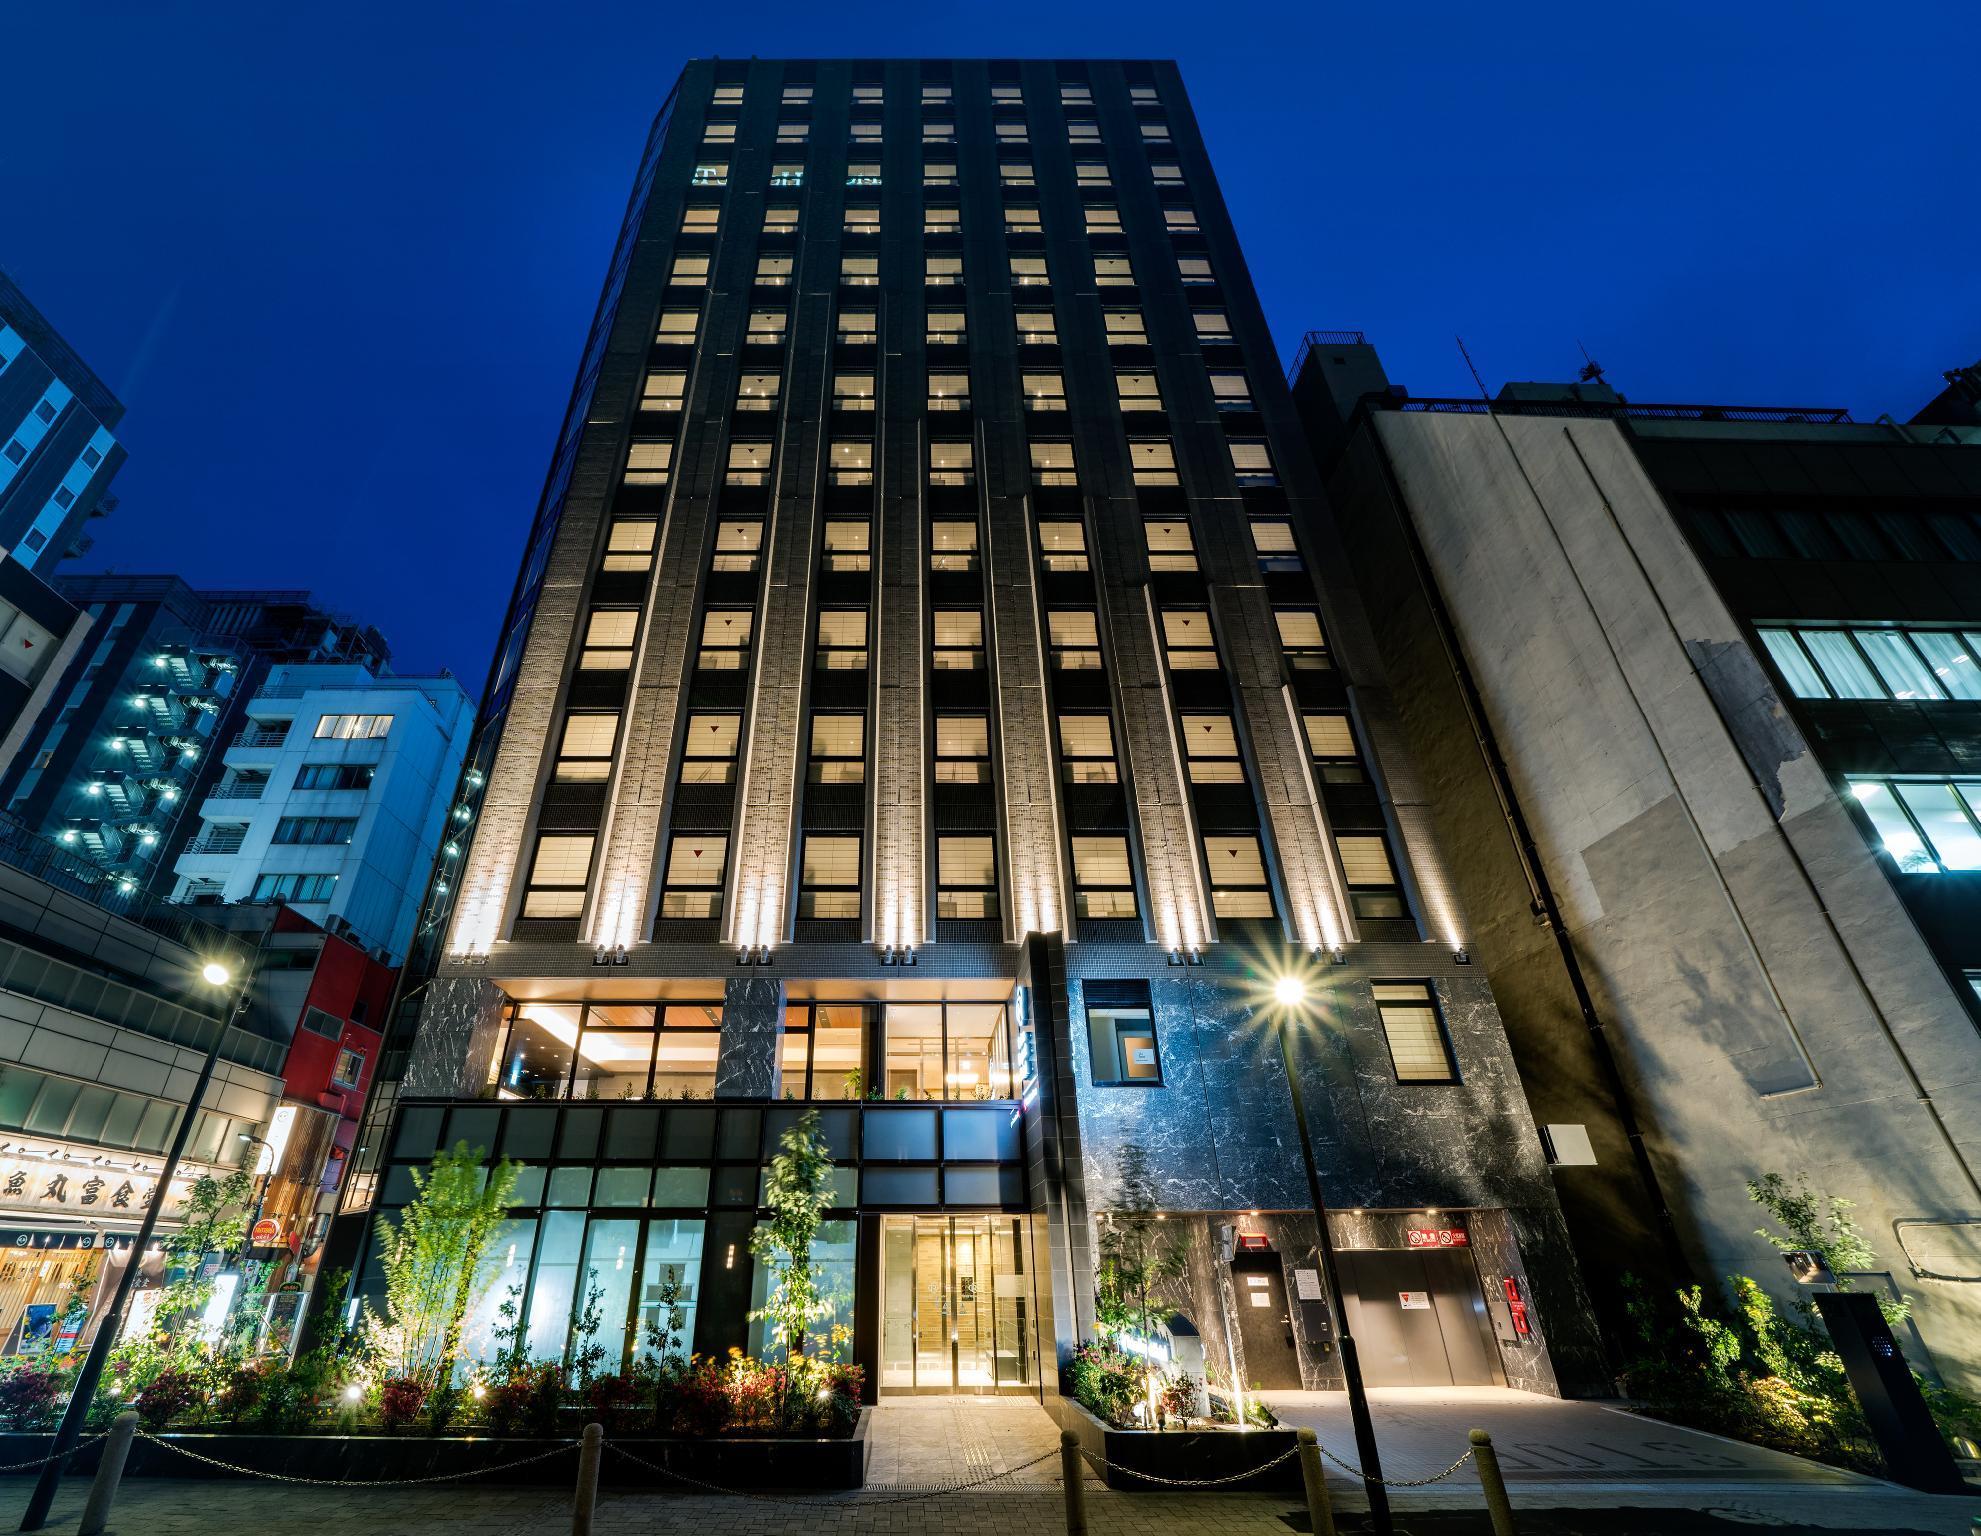 Daiwa Roynet Hotel Shimbashi, Chiyoda